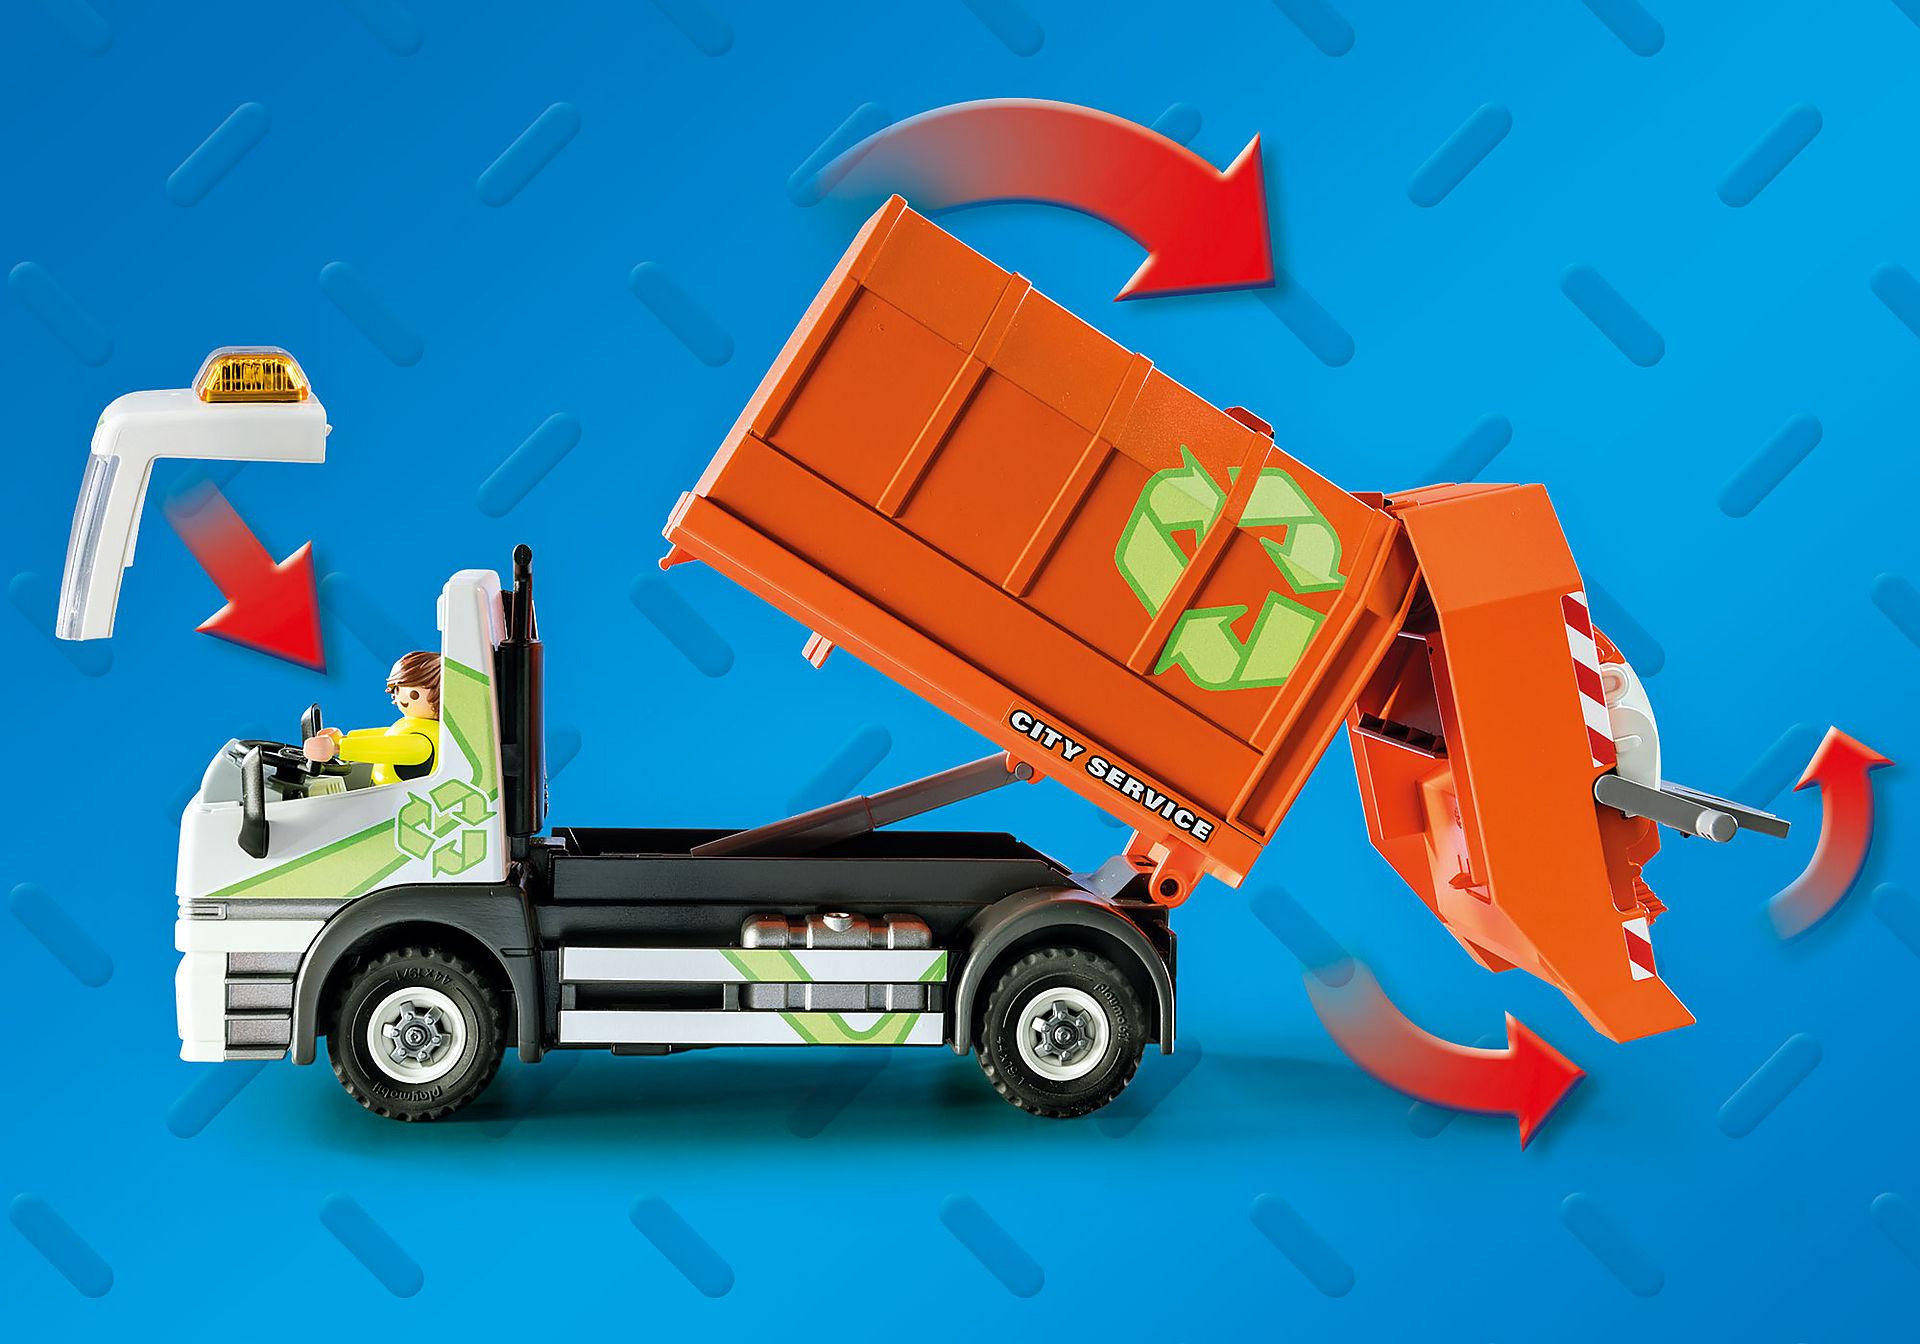 http://media.playmobil.com/i/playmobil/70200_product_extra1/Recycling Truck